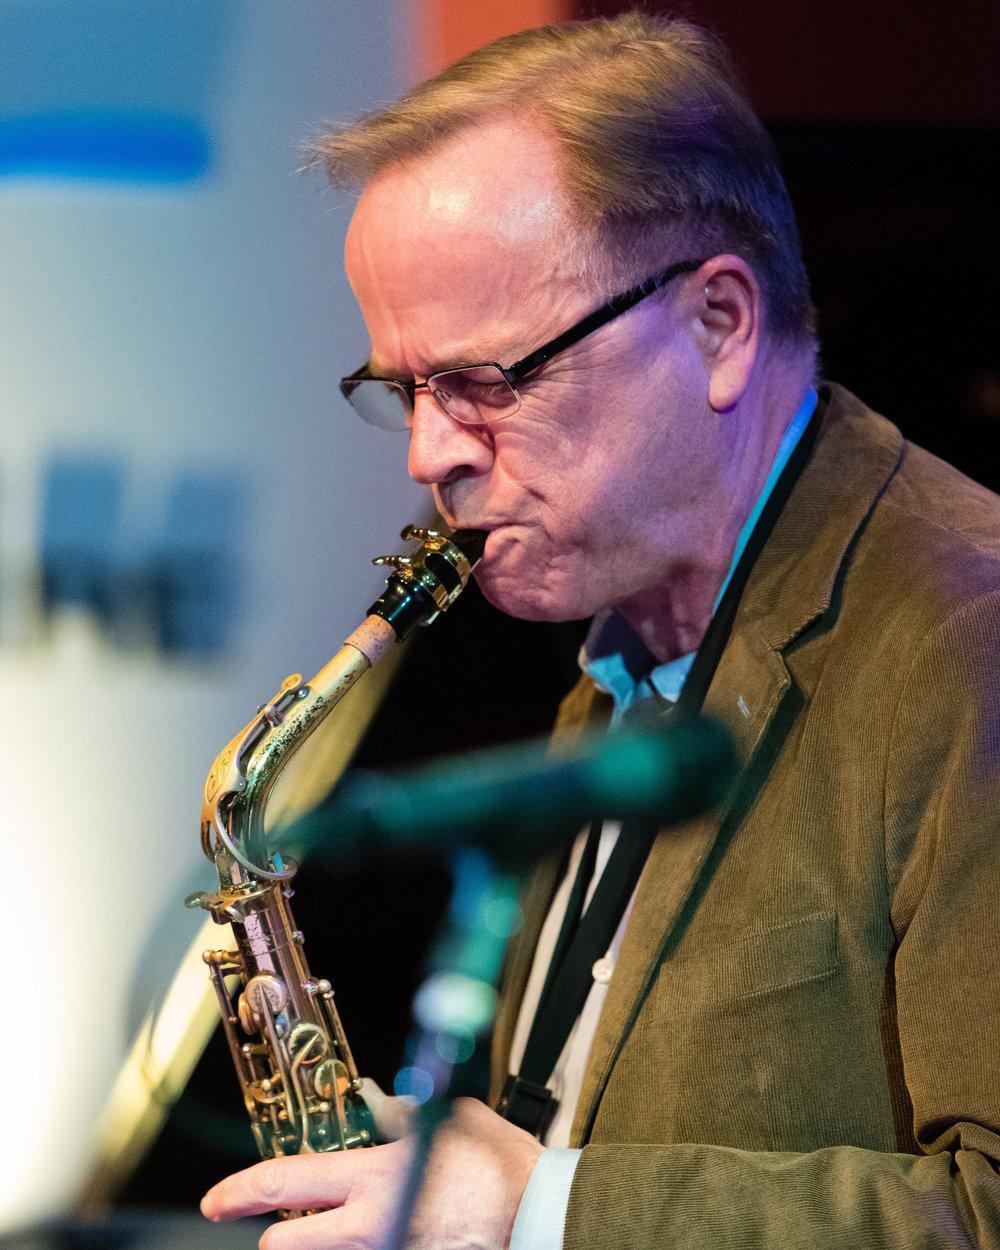 February 7, 2018 Allan Chase on saxophone at The Nash Jazz Phoenix - Joseph Berg Photography